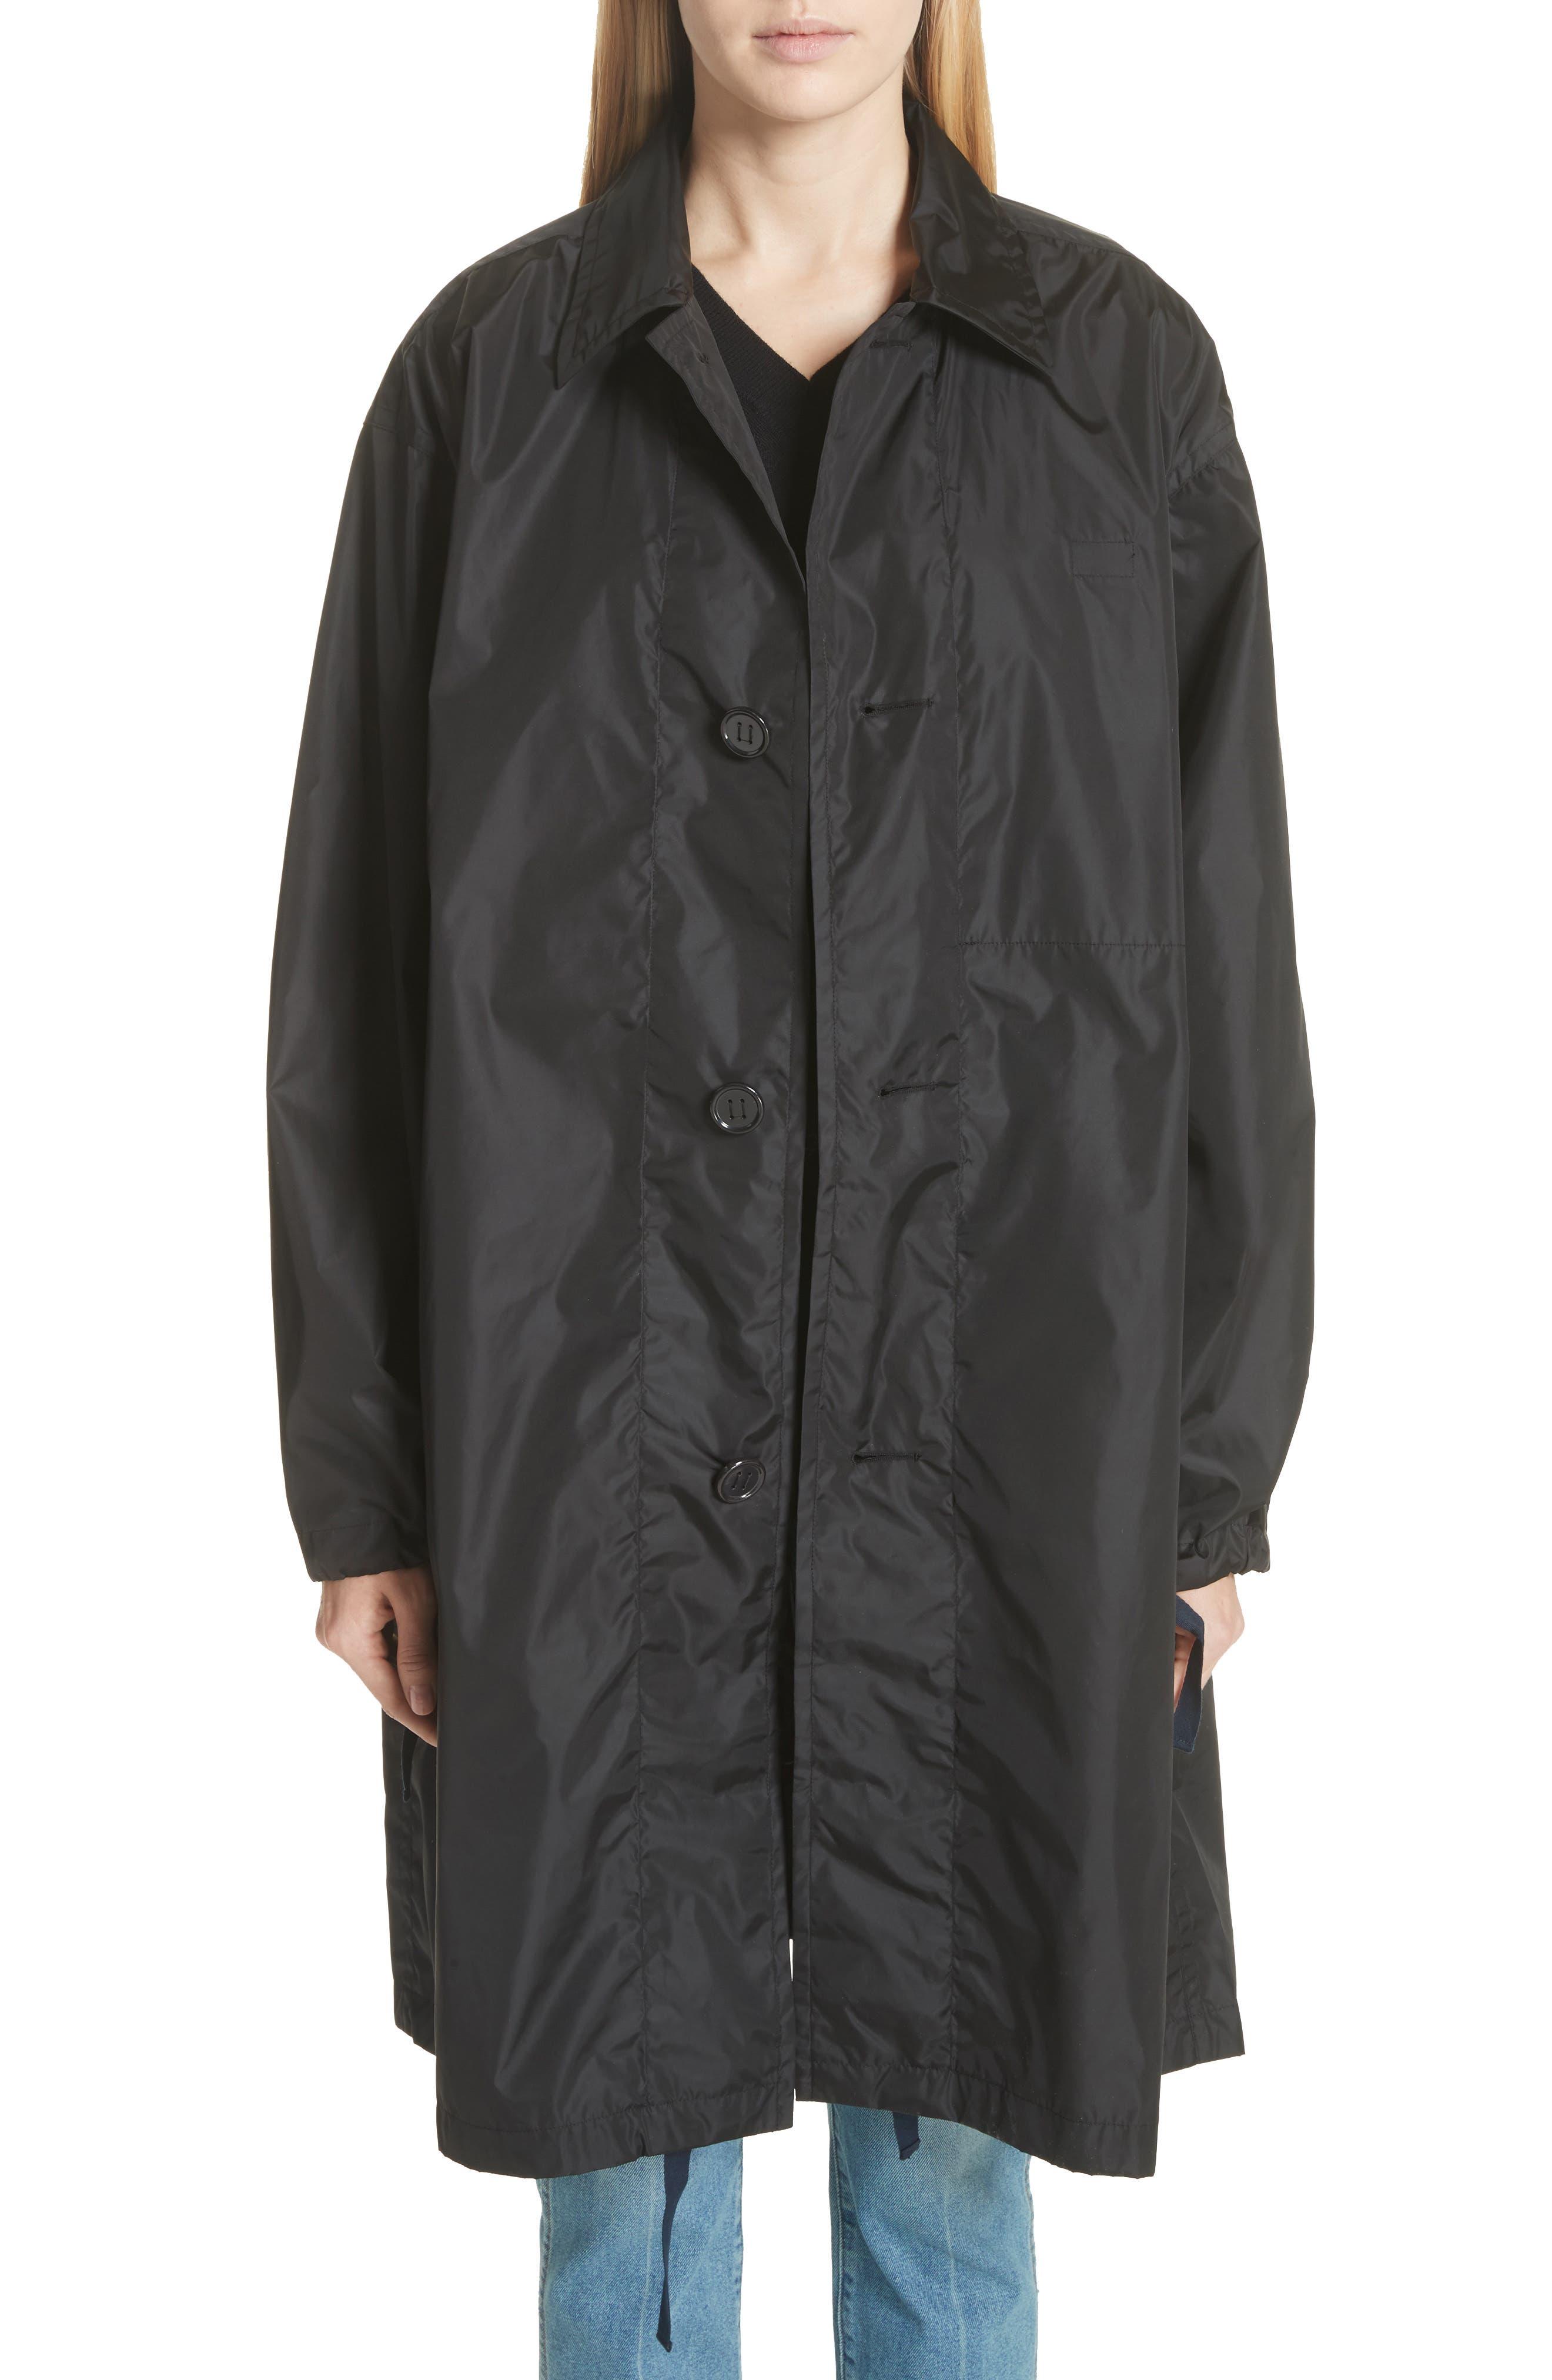 Raincoat with Inside Suspenders,                         Main,                         color, Black